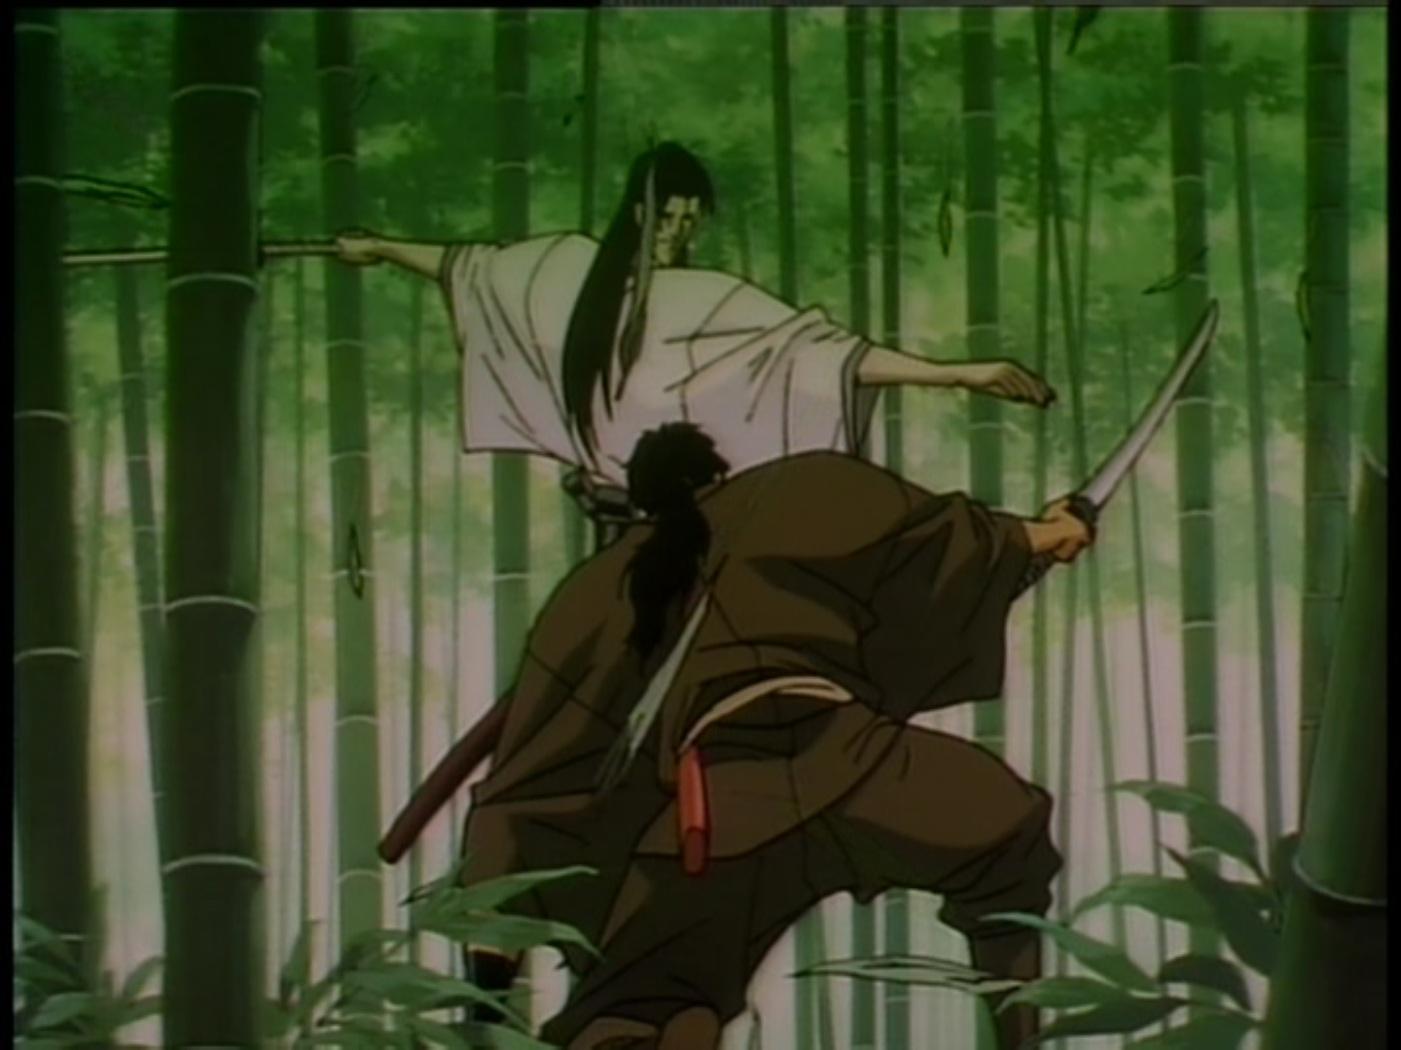 Anime Devil Wallpaper Happyotter Ninja Scroll 1993